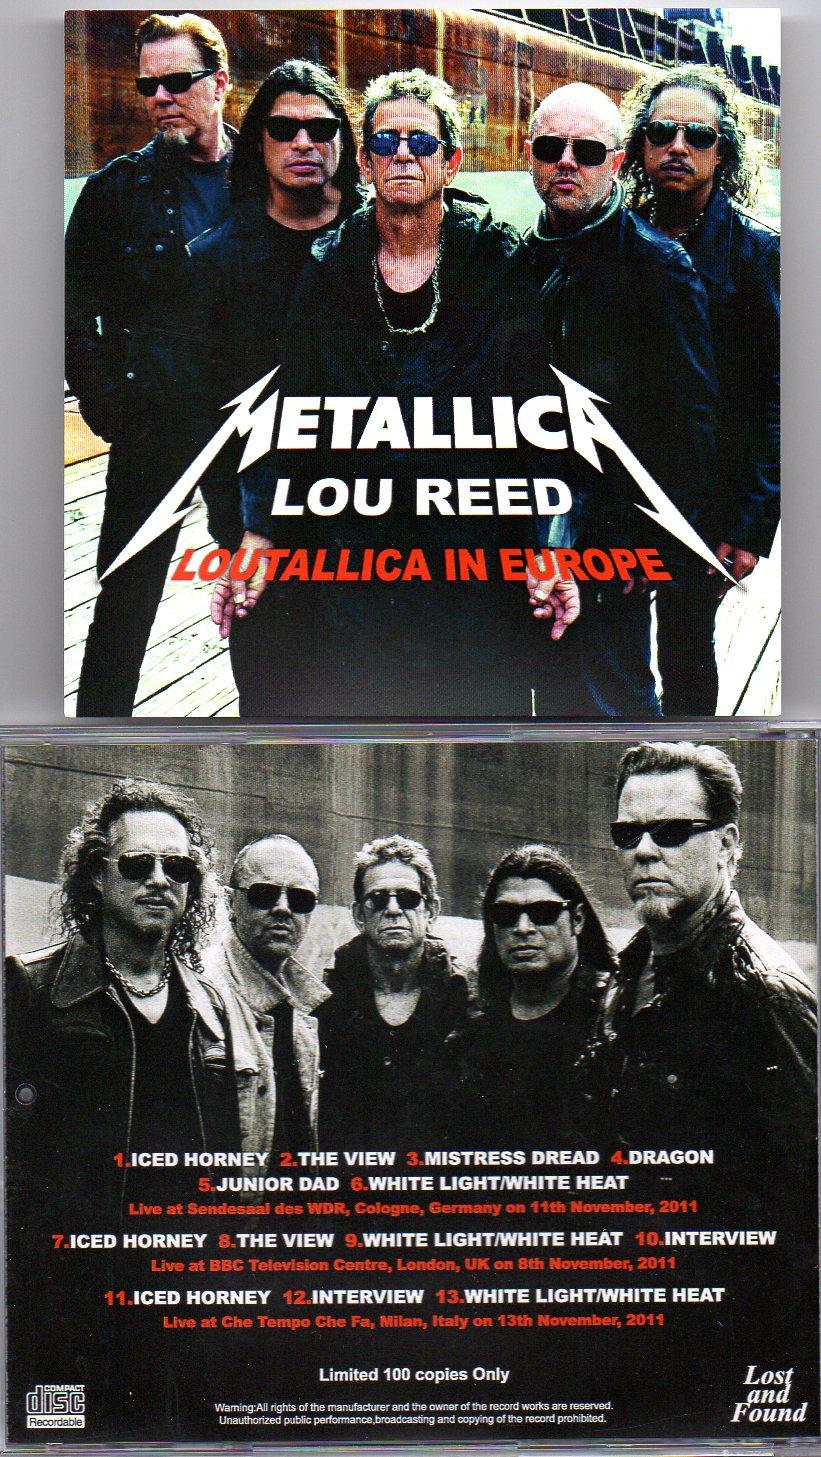 Metallica - Loutallica in Europe 2011 ( W/ Lou Reed in Cologne Germany Nov  11th , London UK Nov 8th & Milan Italy , Nov 13th )